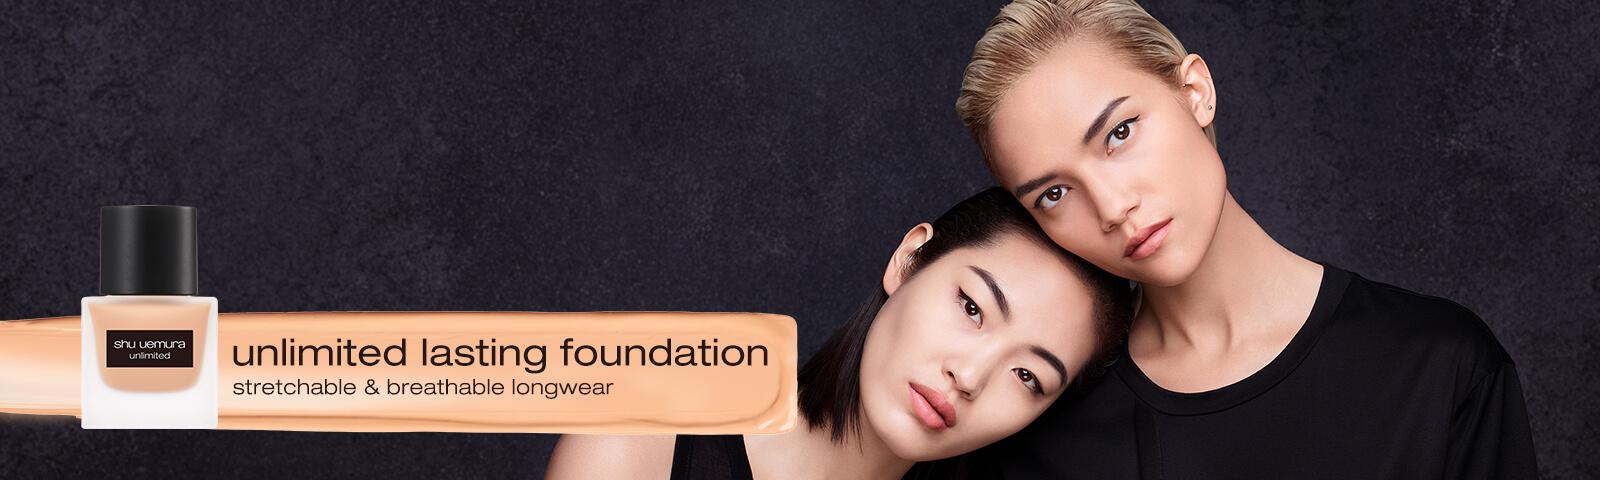 Shu uemura Foundation 1